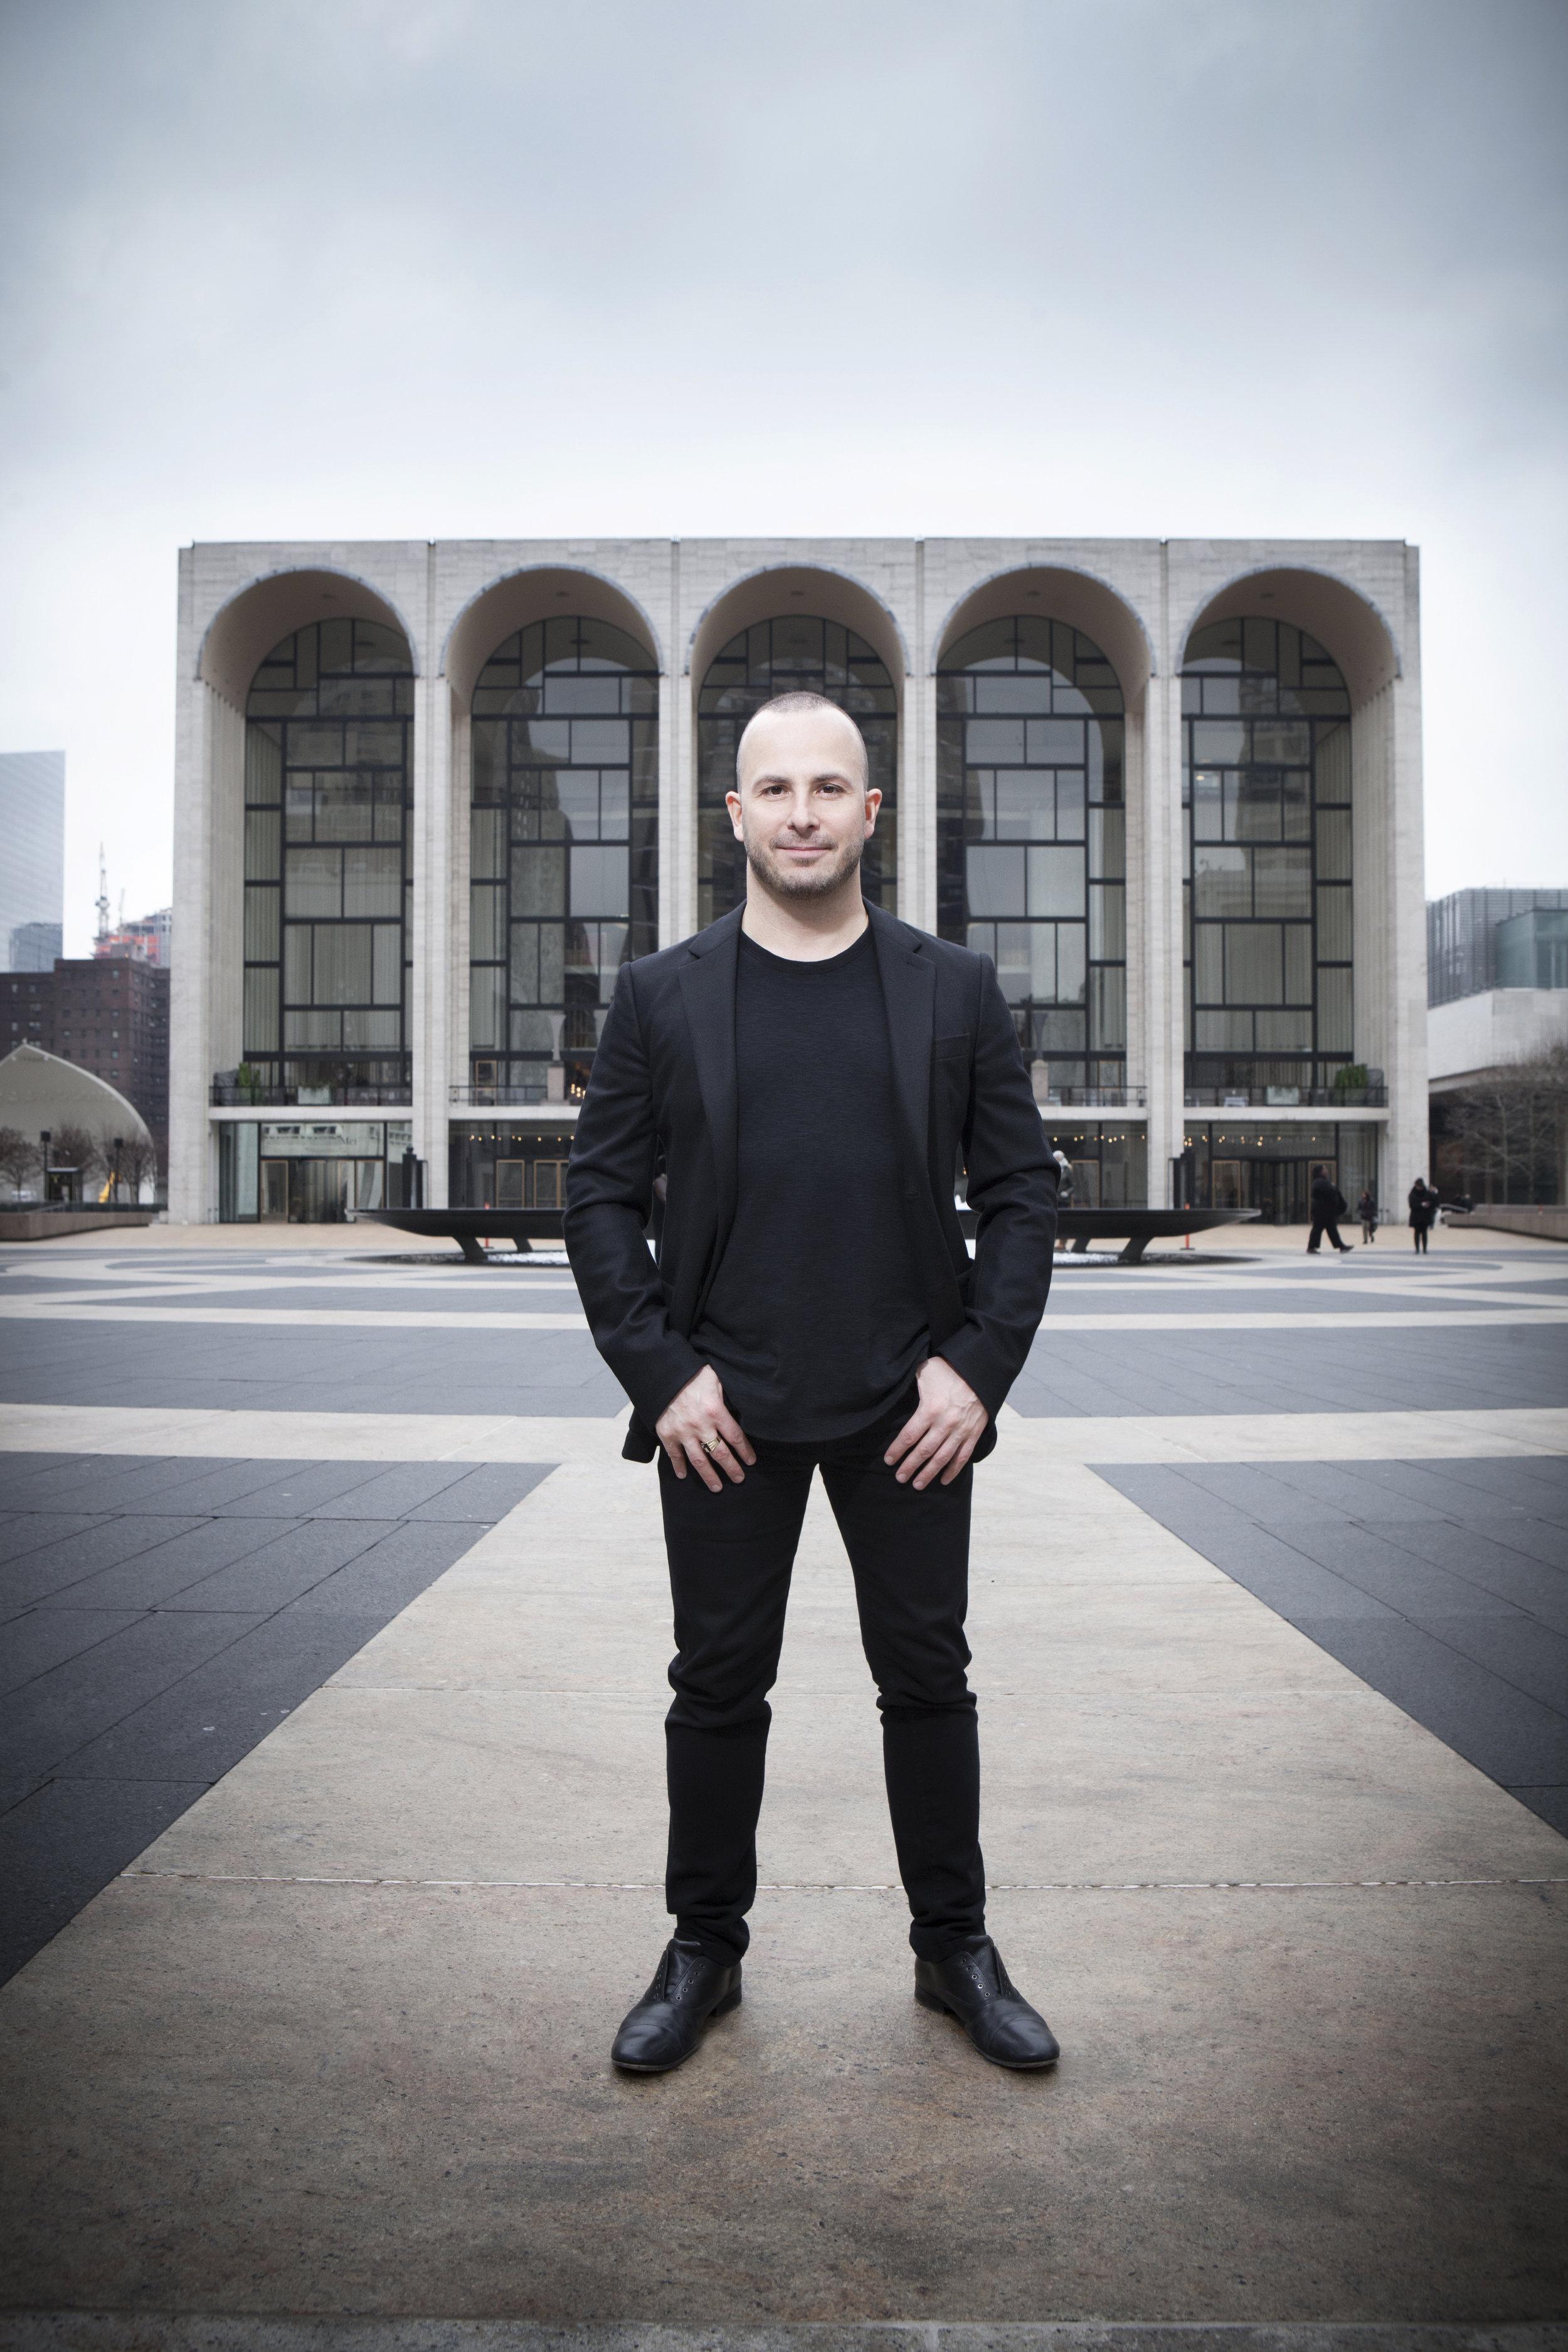 Yannick Nézet-Séguin, Music Director for Metropolitan Opera